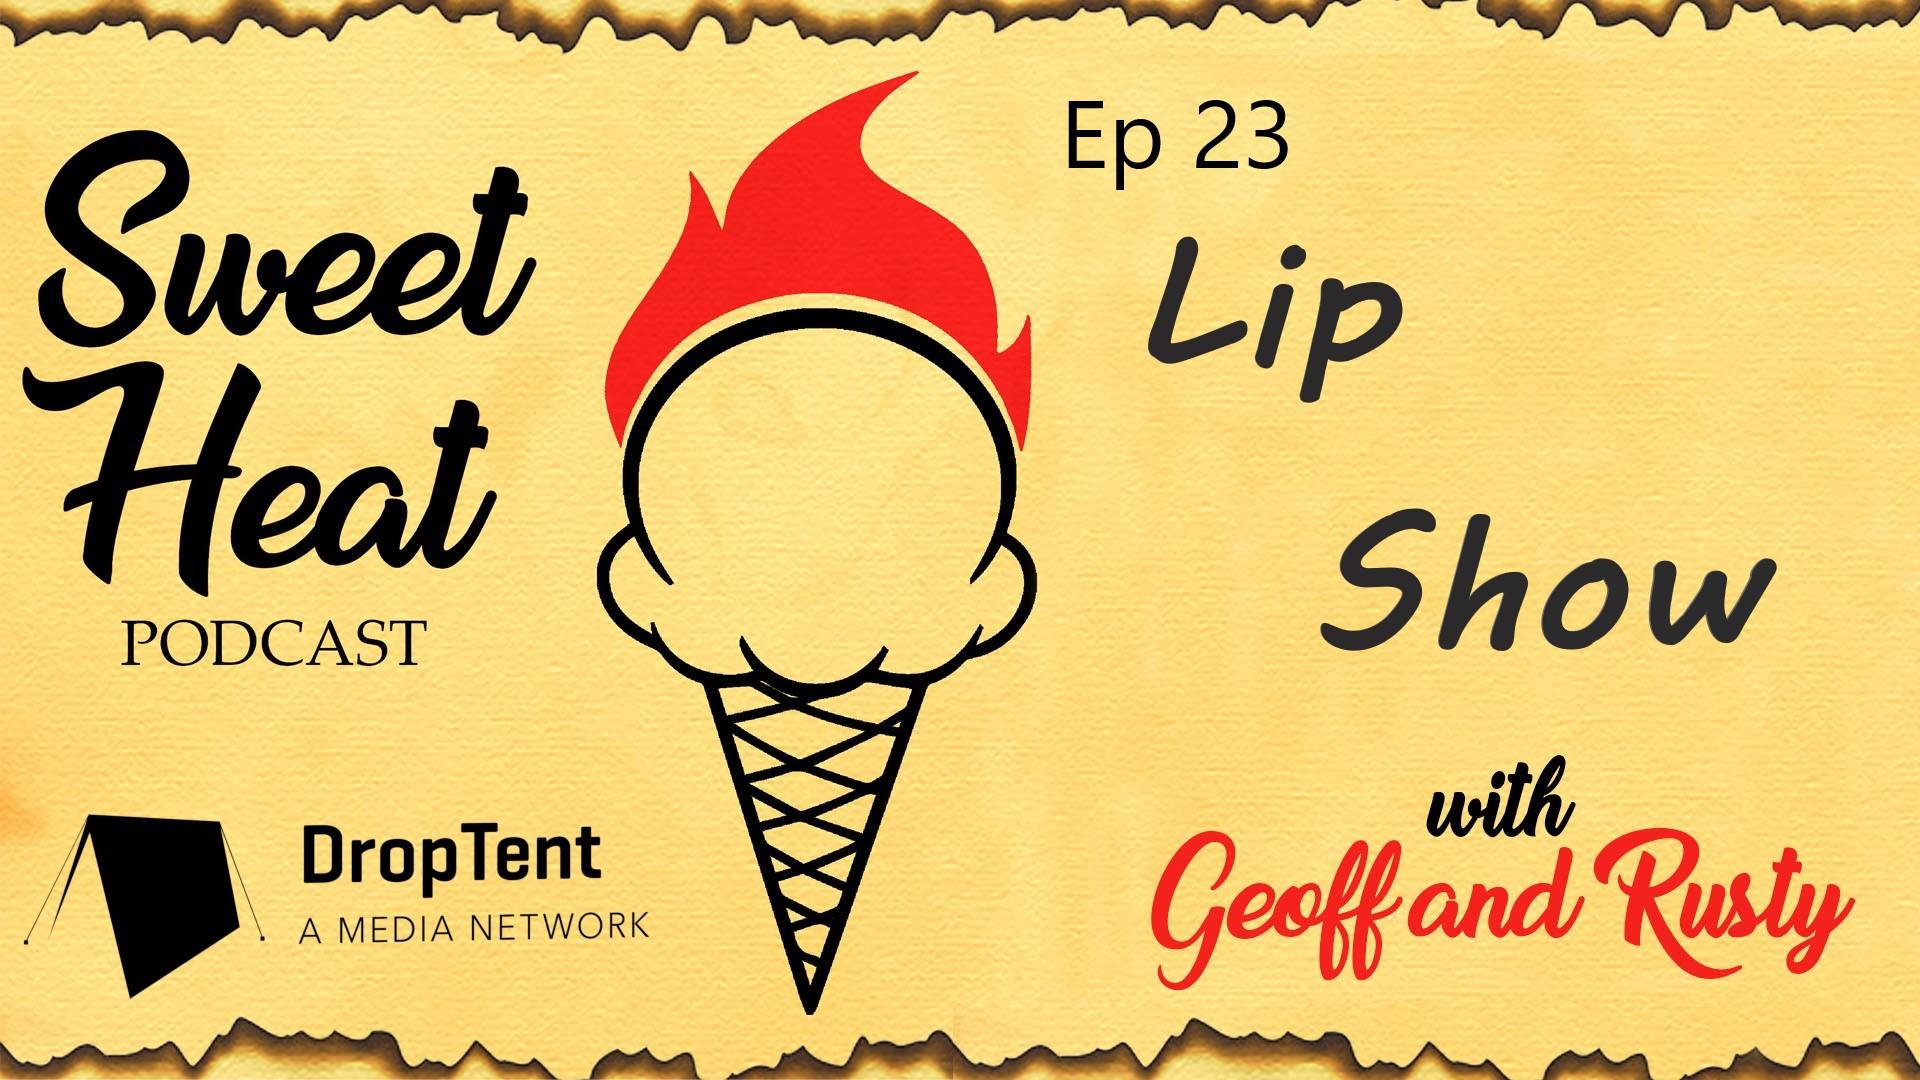 Lip Show - Ep 23 show art